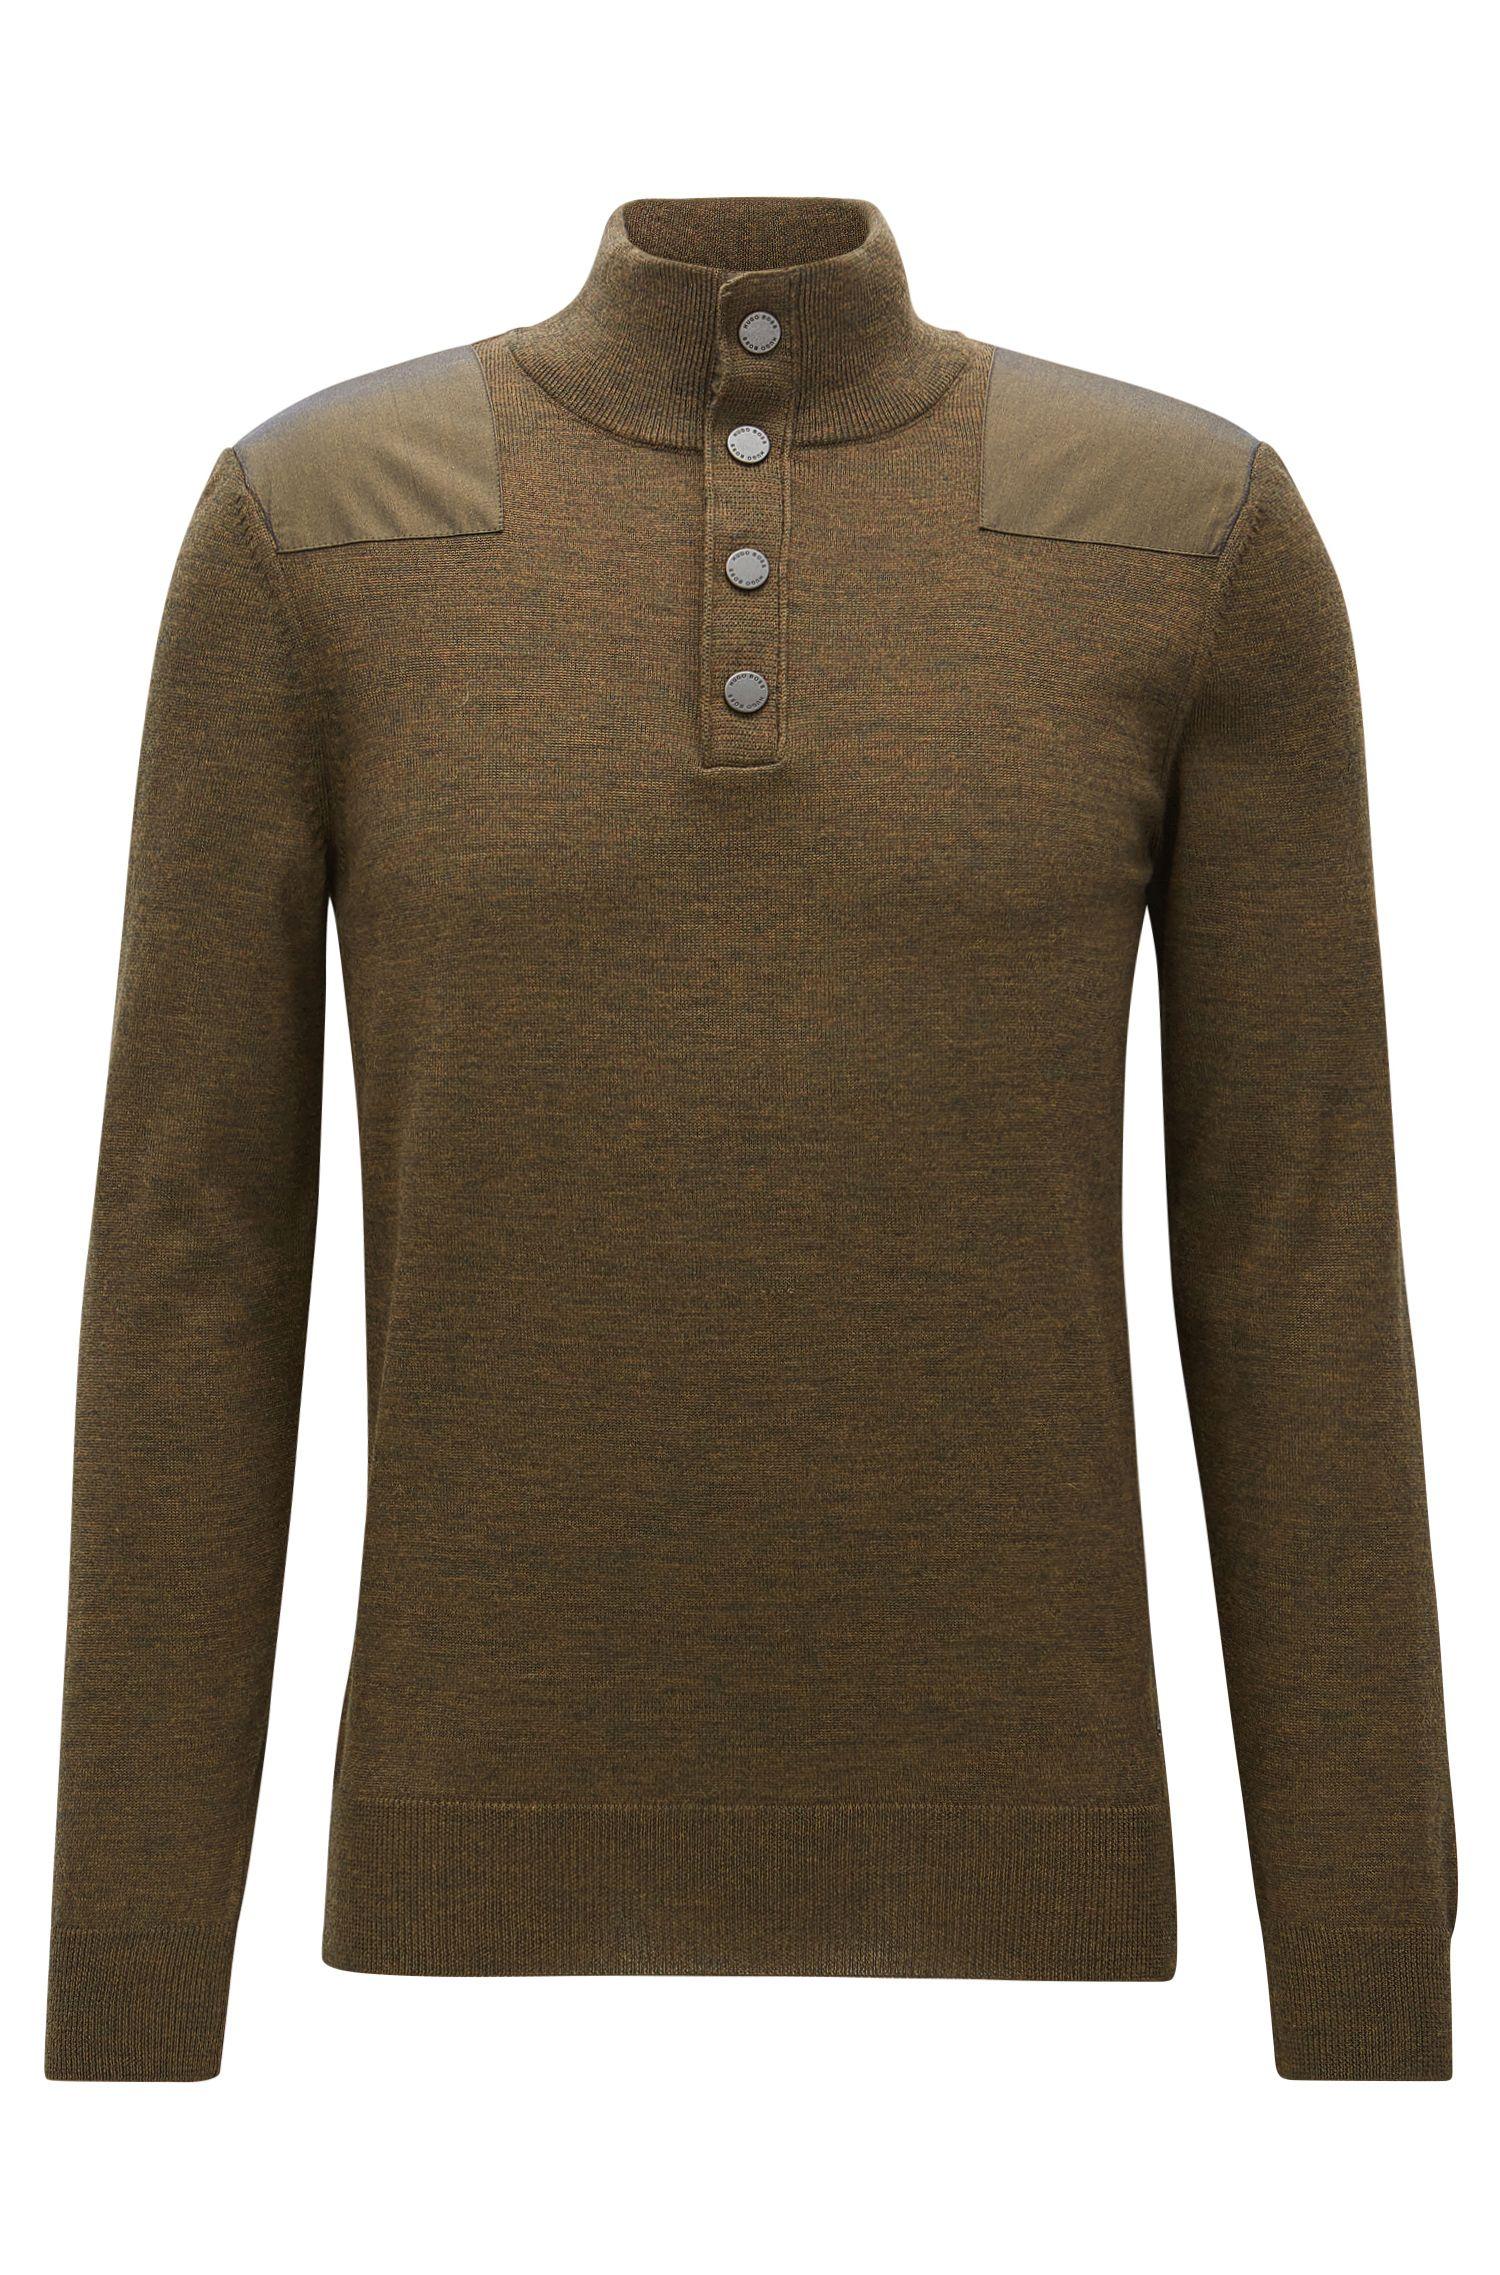 'Novellino' | Extra-Fine Merino Wool Sweater